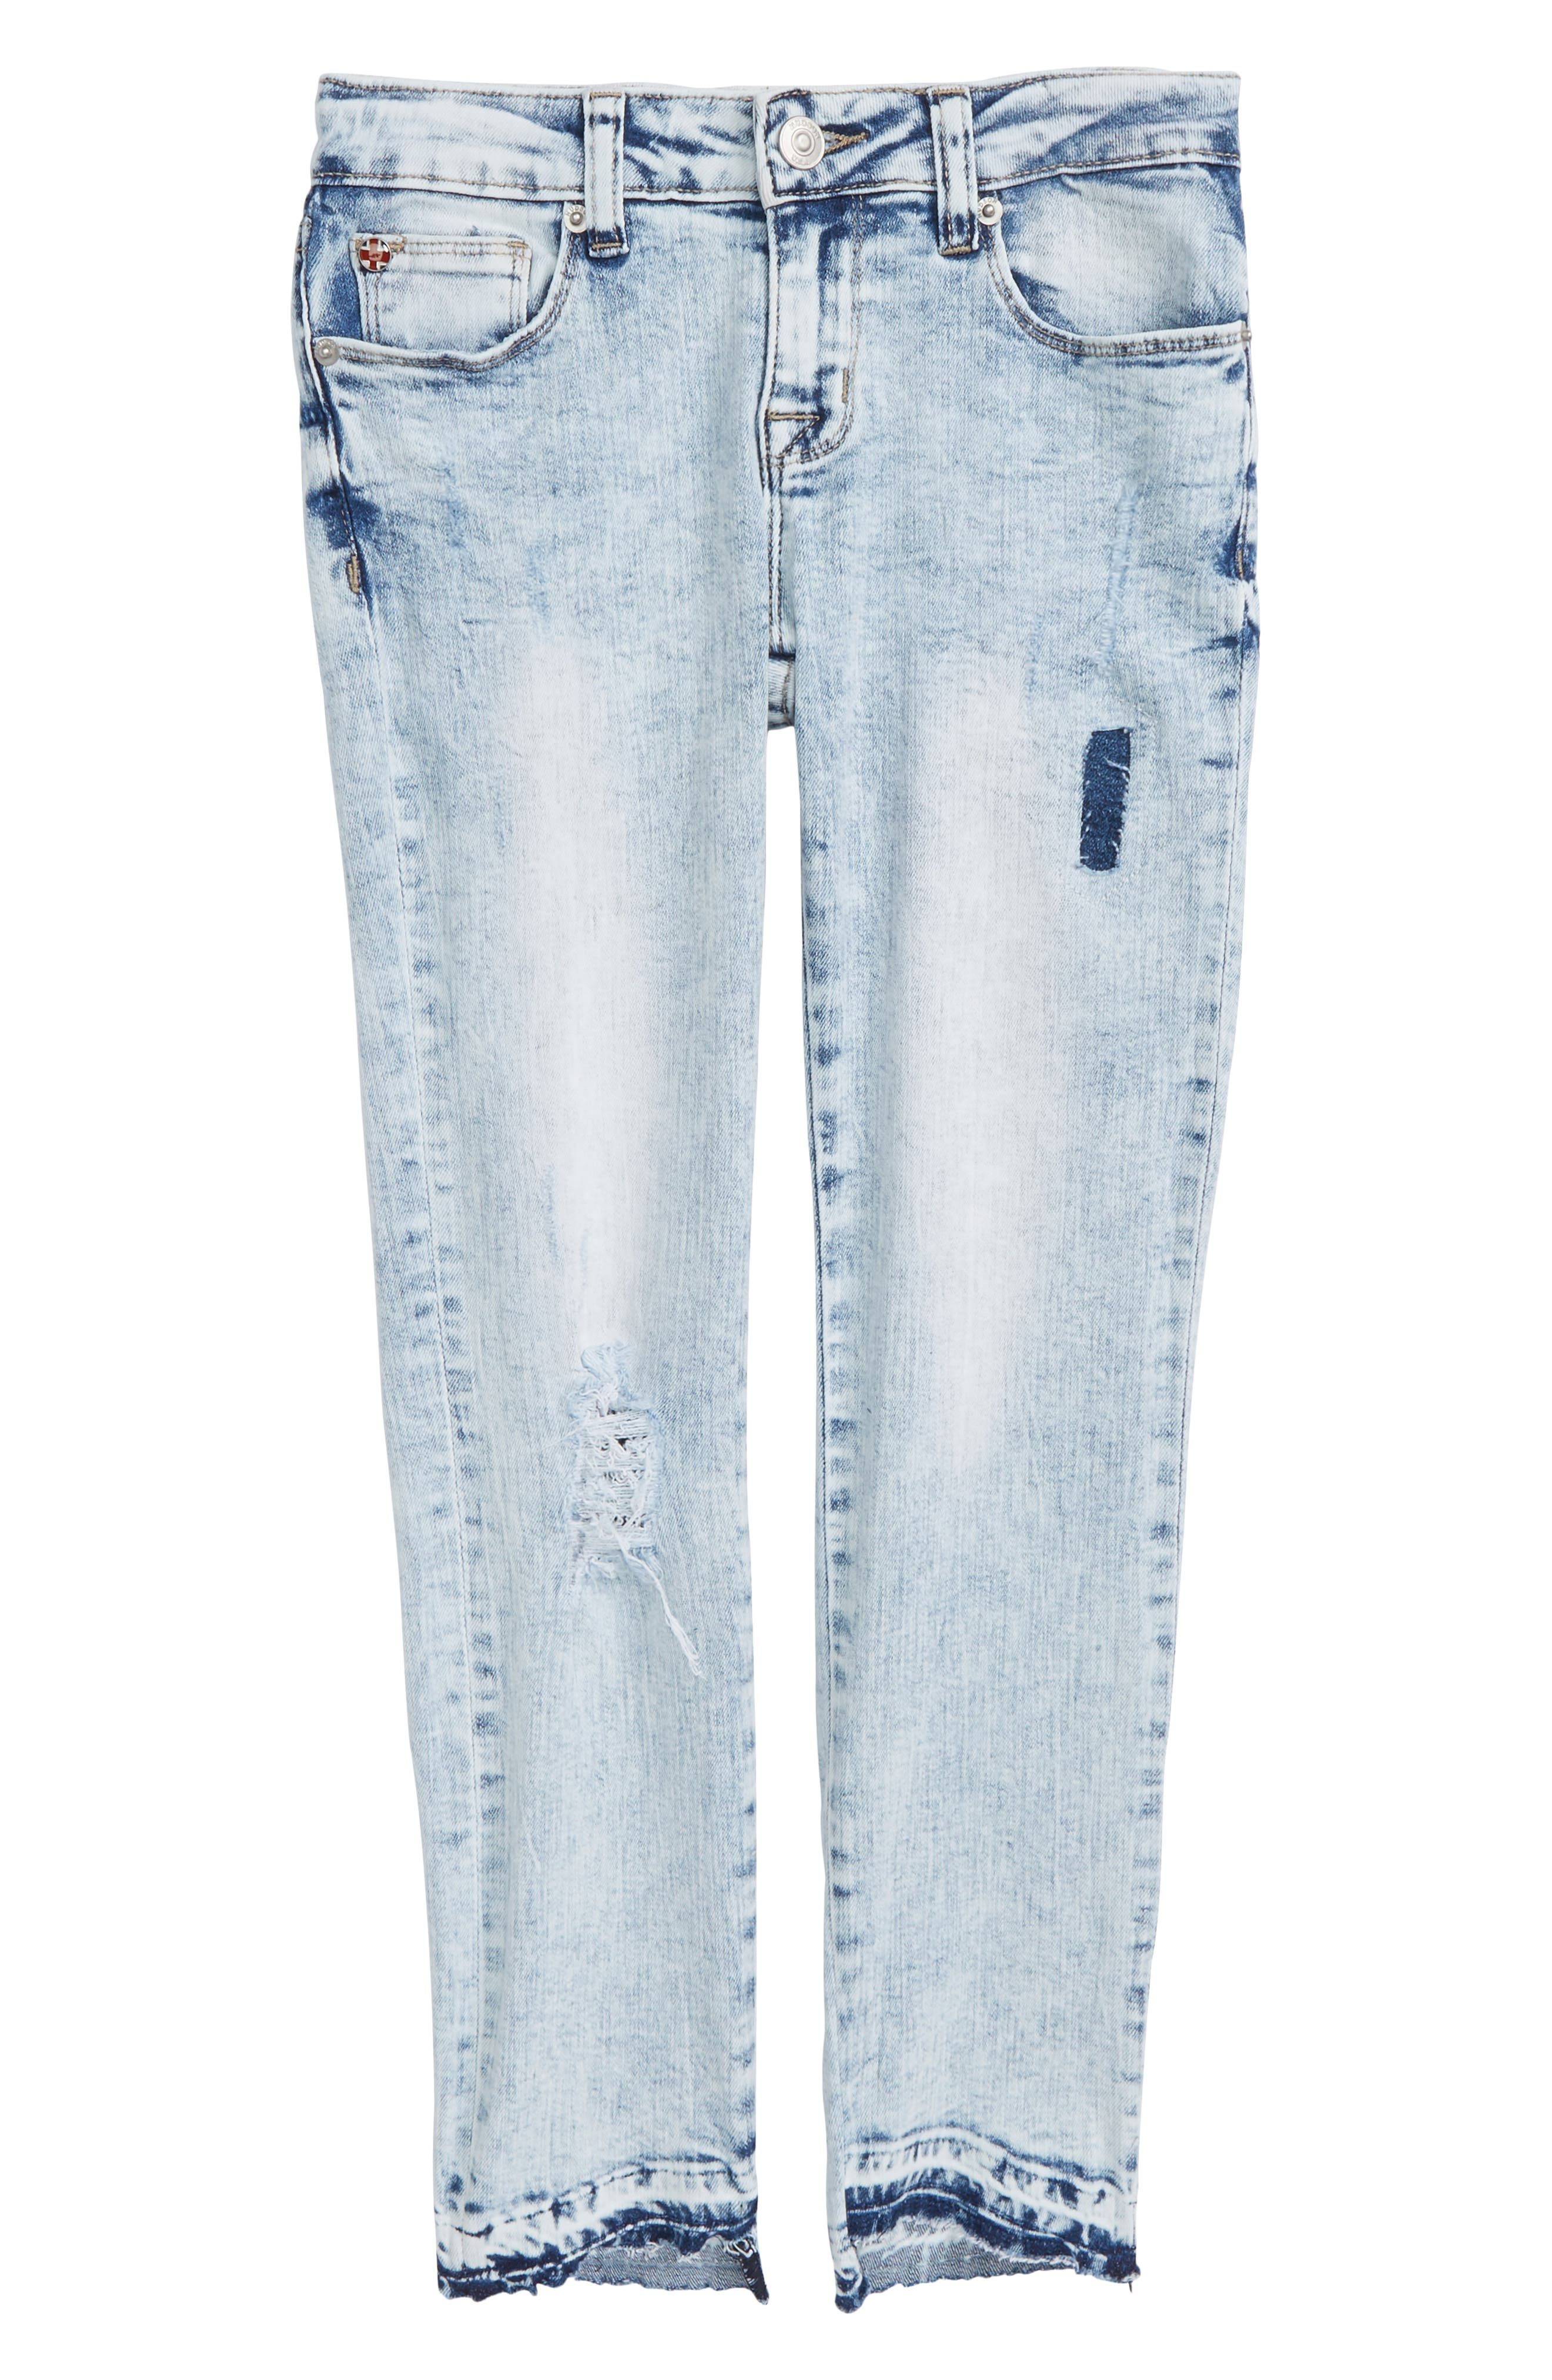 Vicky Crop Skinny Jeans,                         Main,                         color, Iceberg Wash